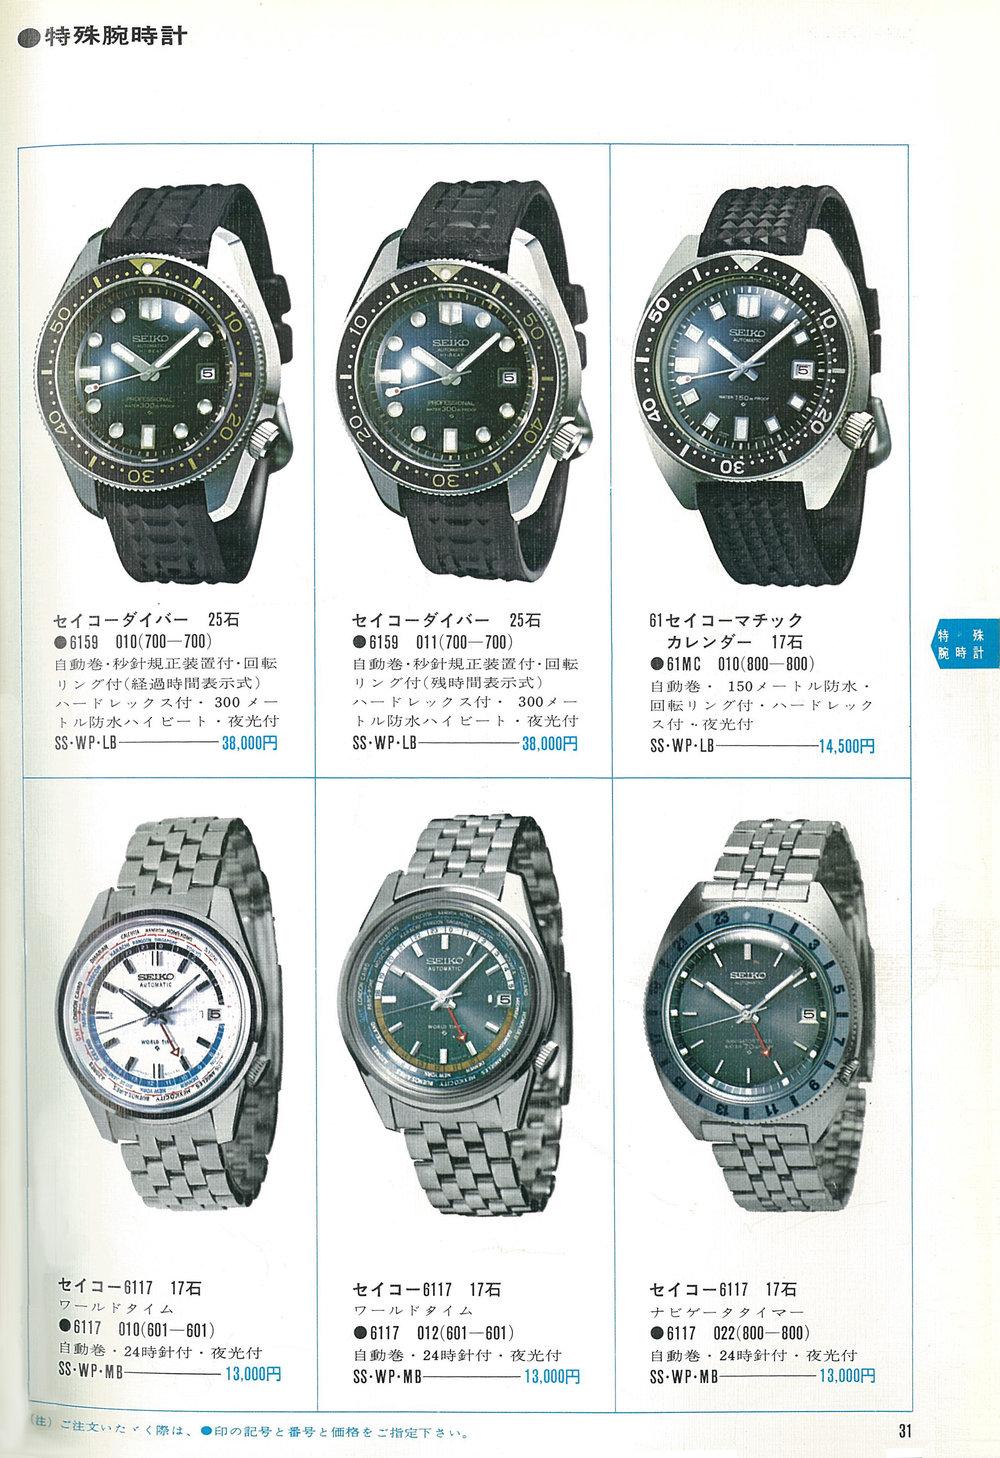 1969 Vol.1 Seiko JDM Catalog